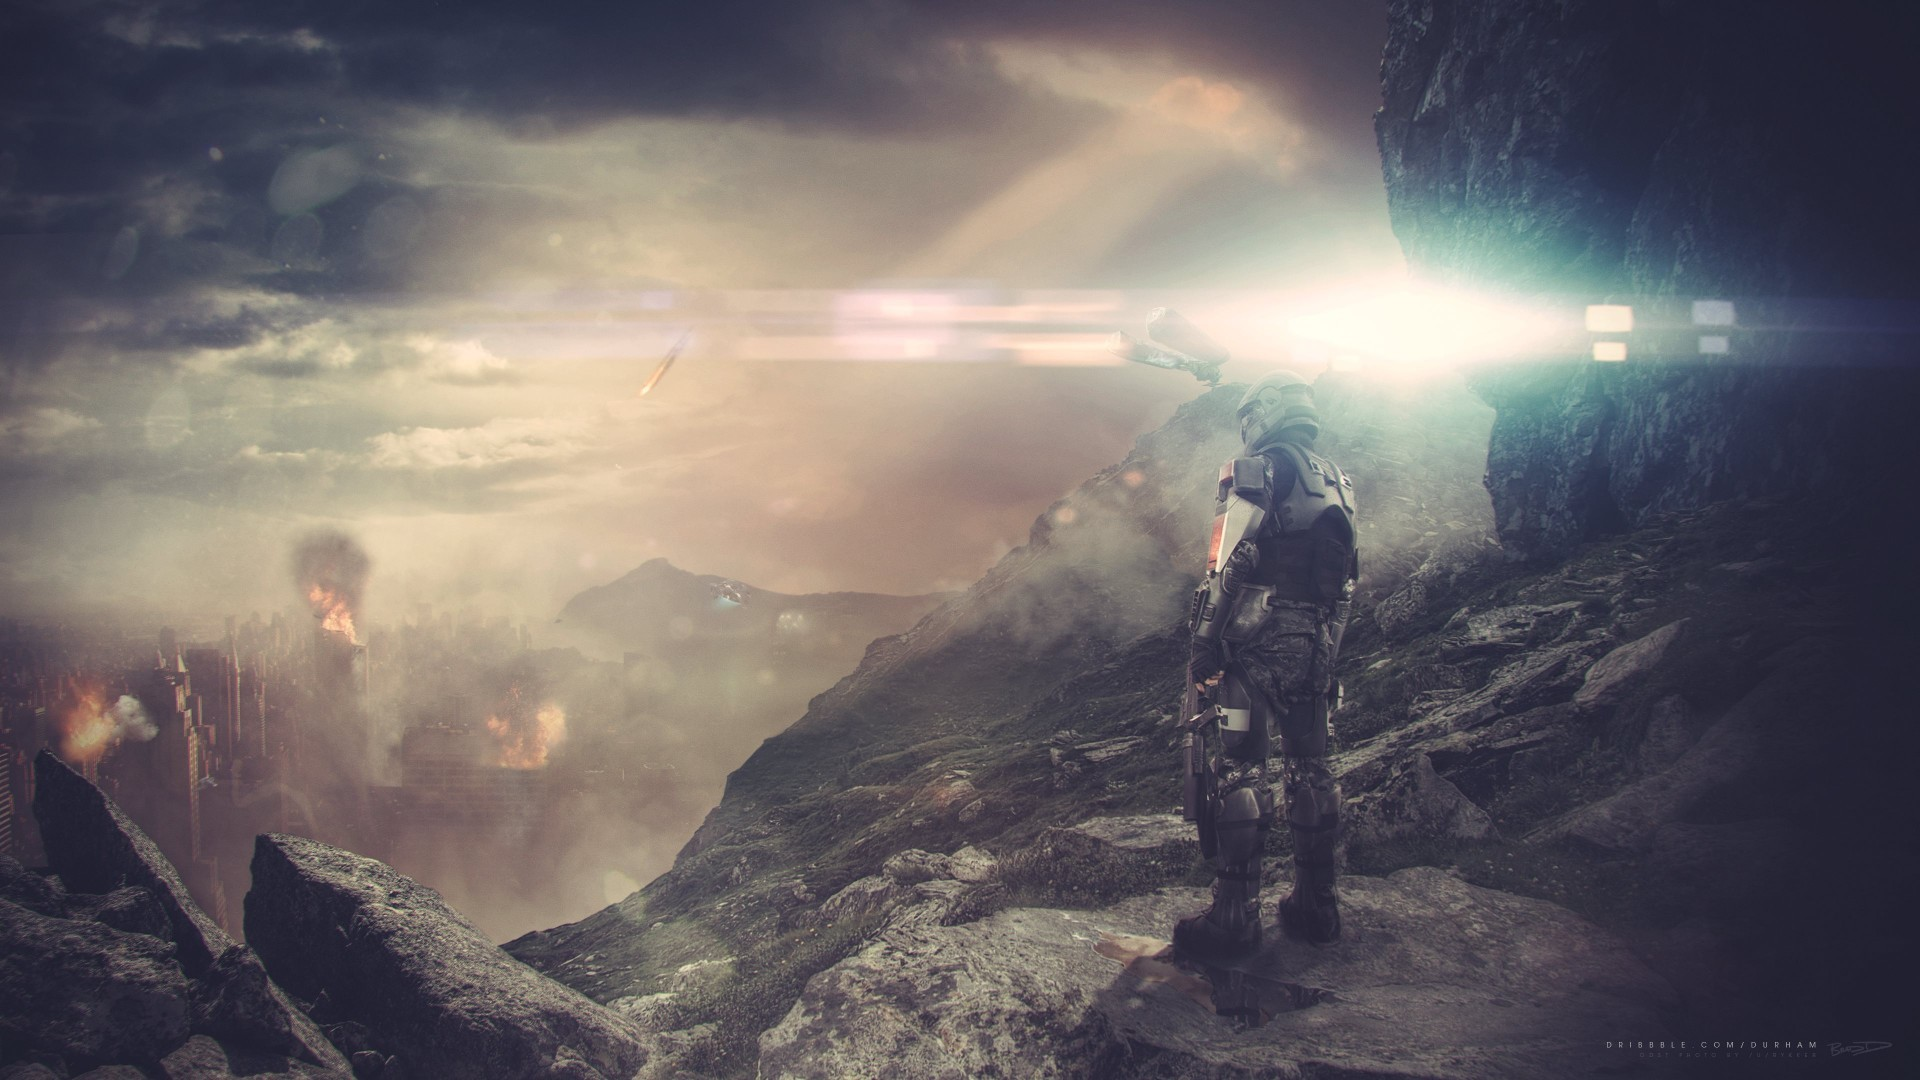 Halo 5: Guardians Wallpaper, Art / Recent: Halo 5: Guardians, game